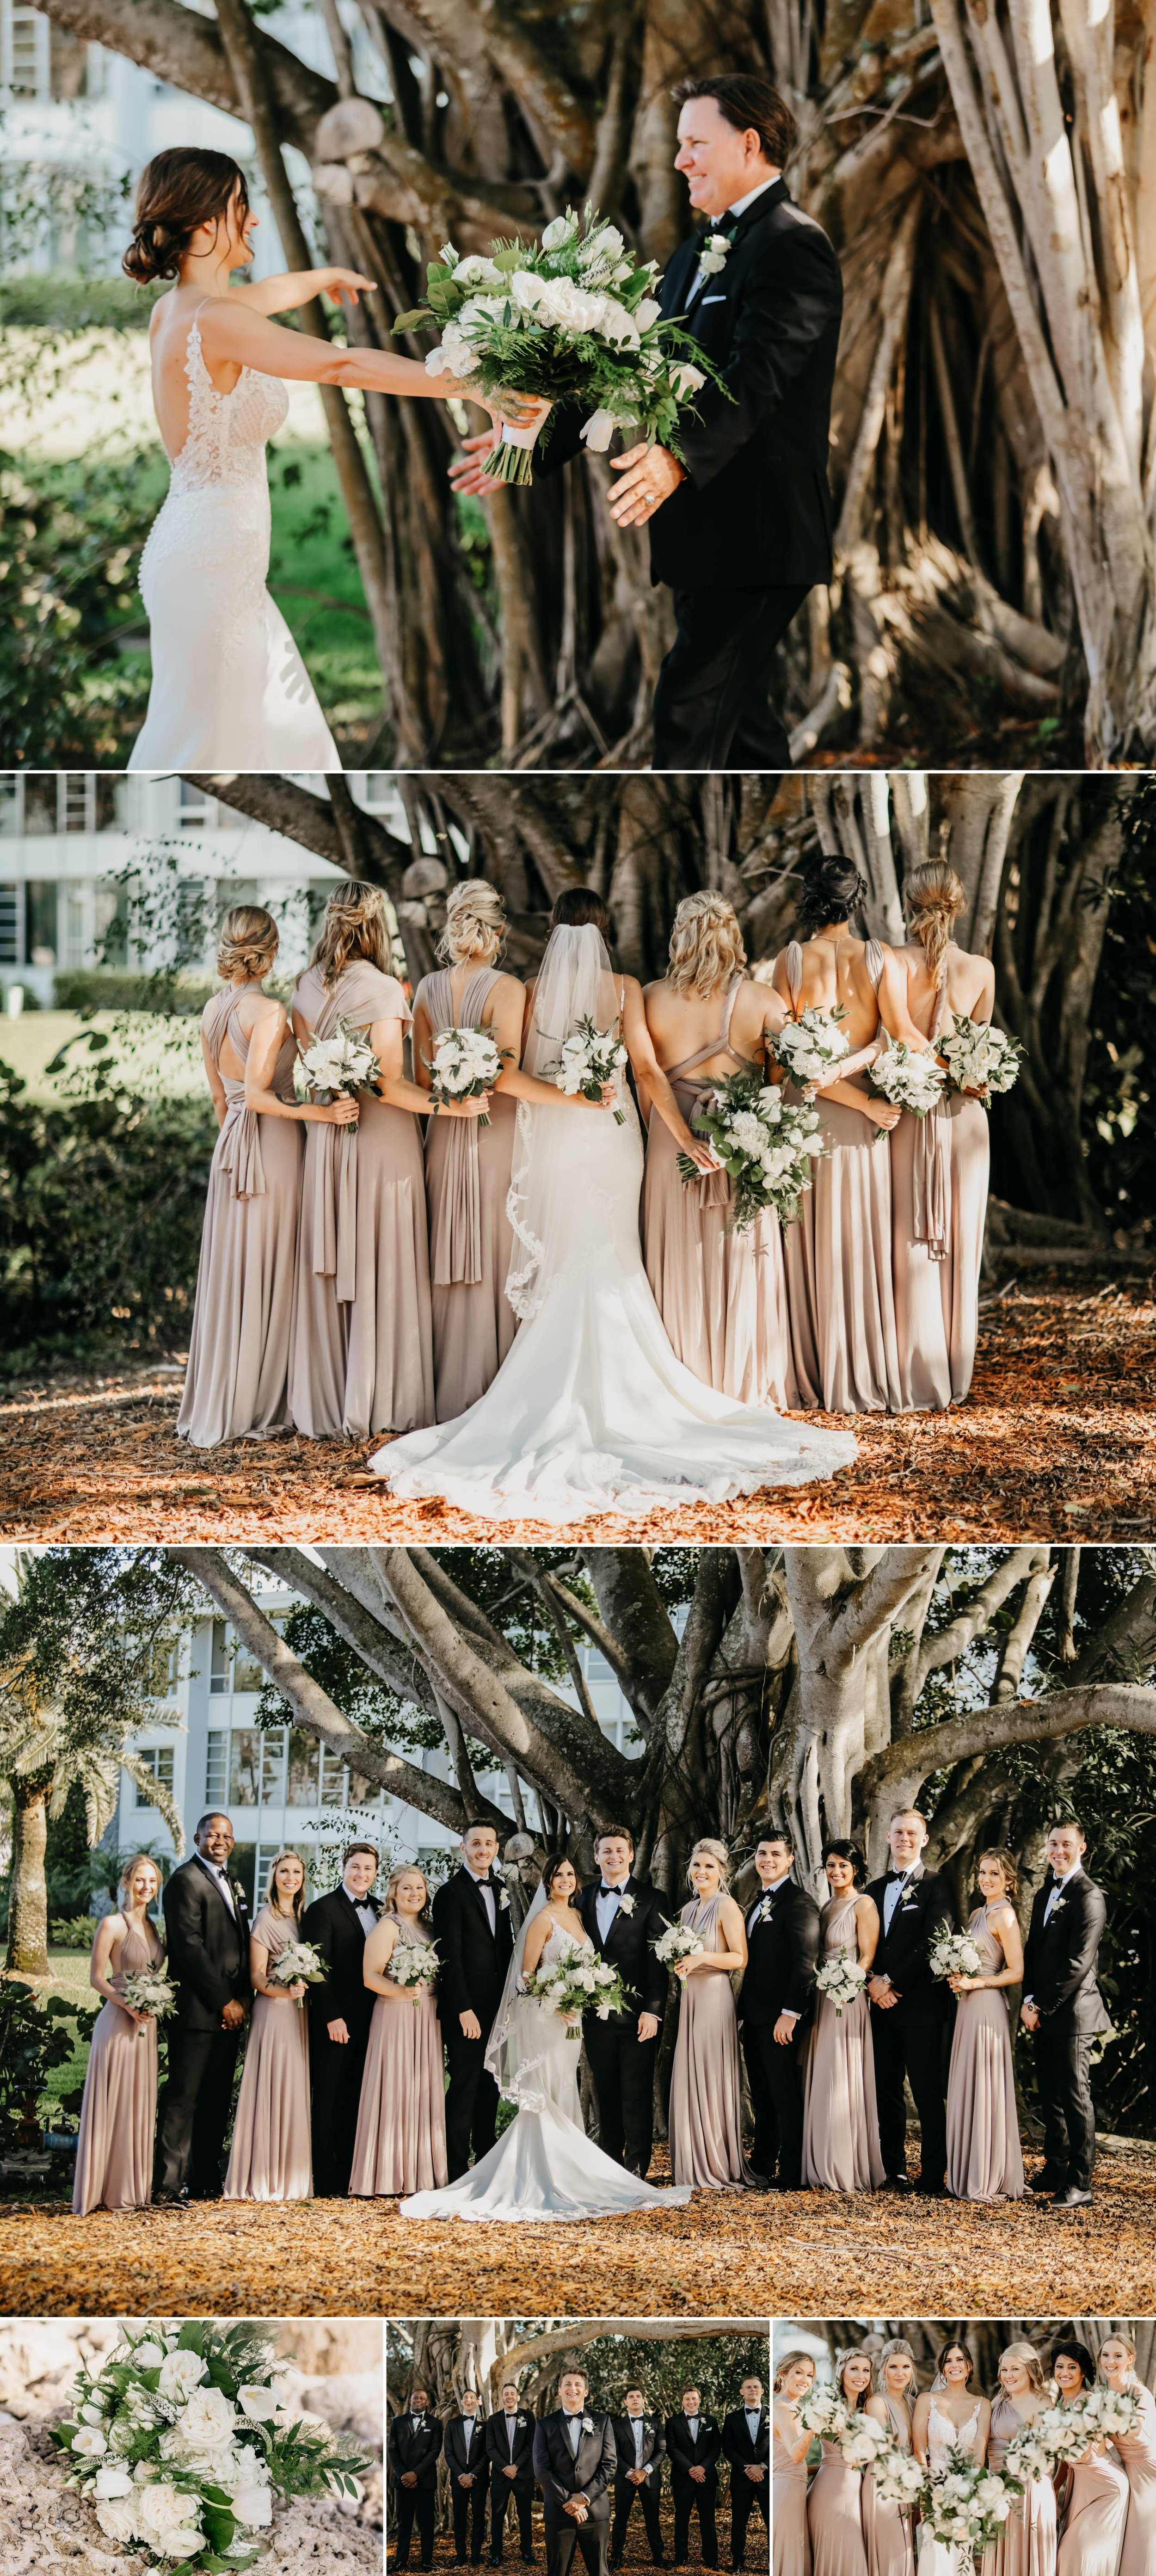 Luxe_tropical_travel_destination_wedding_photography_ShainaDeCiryan.com13.jpg